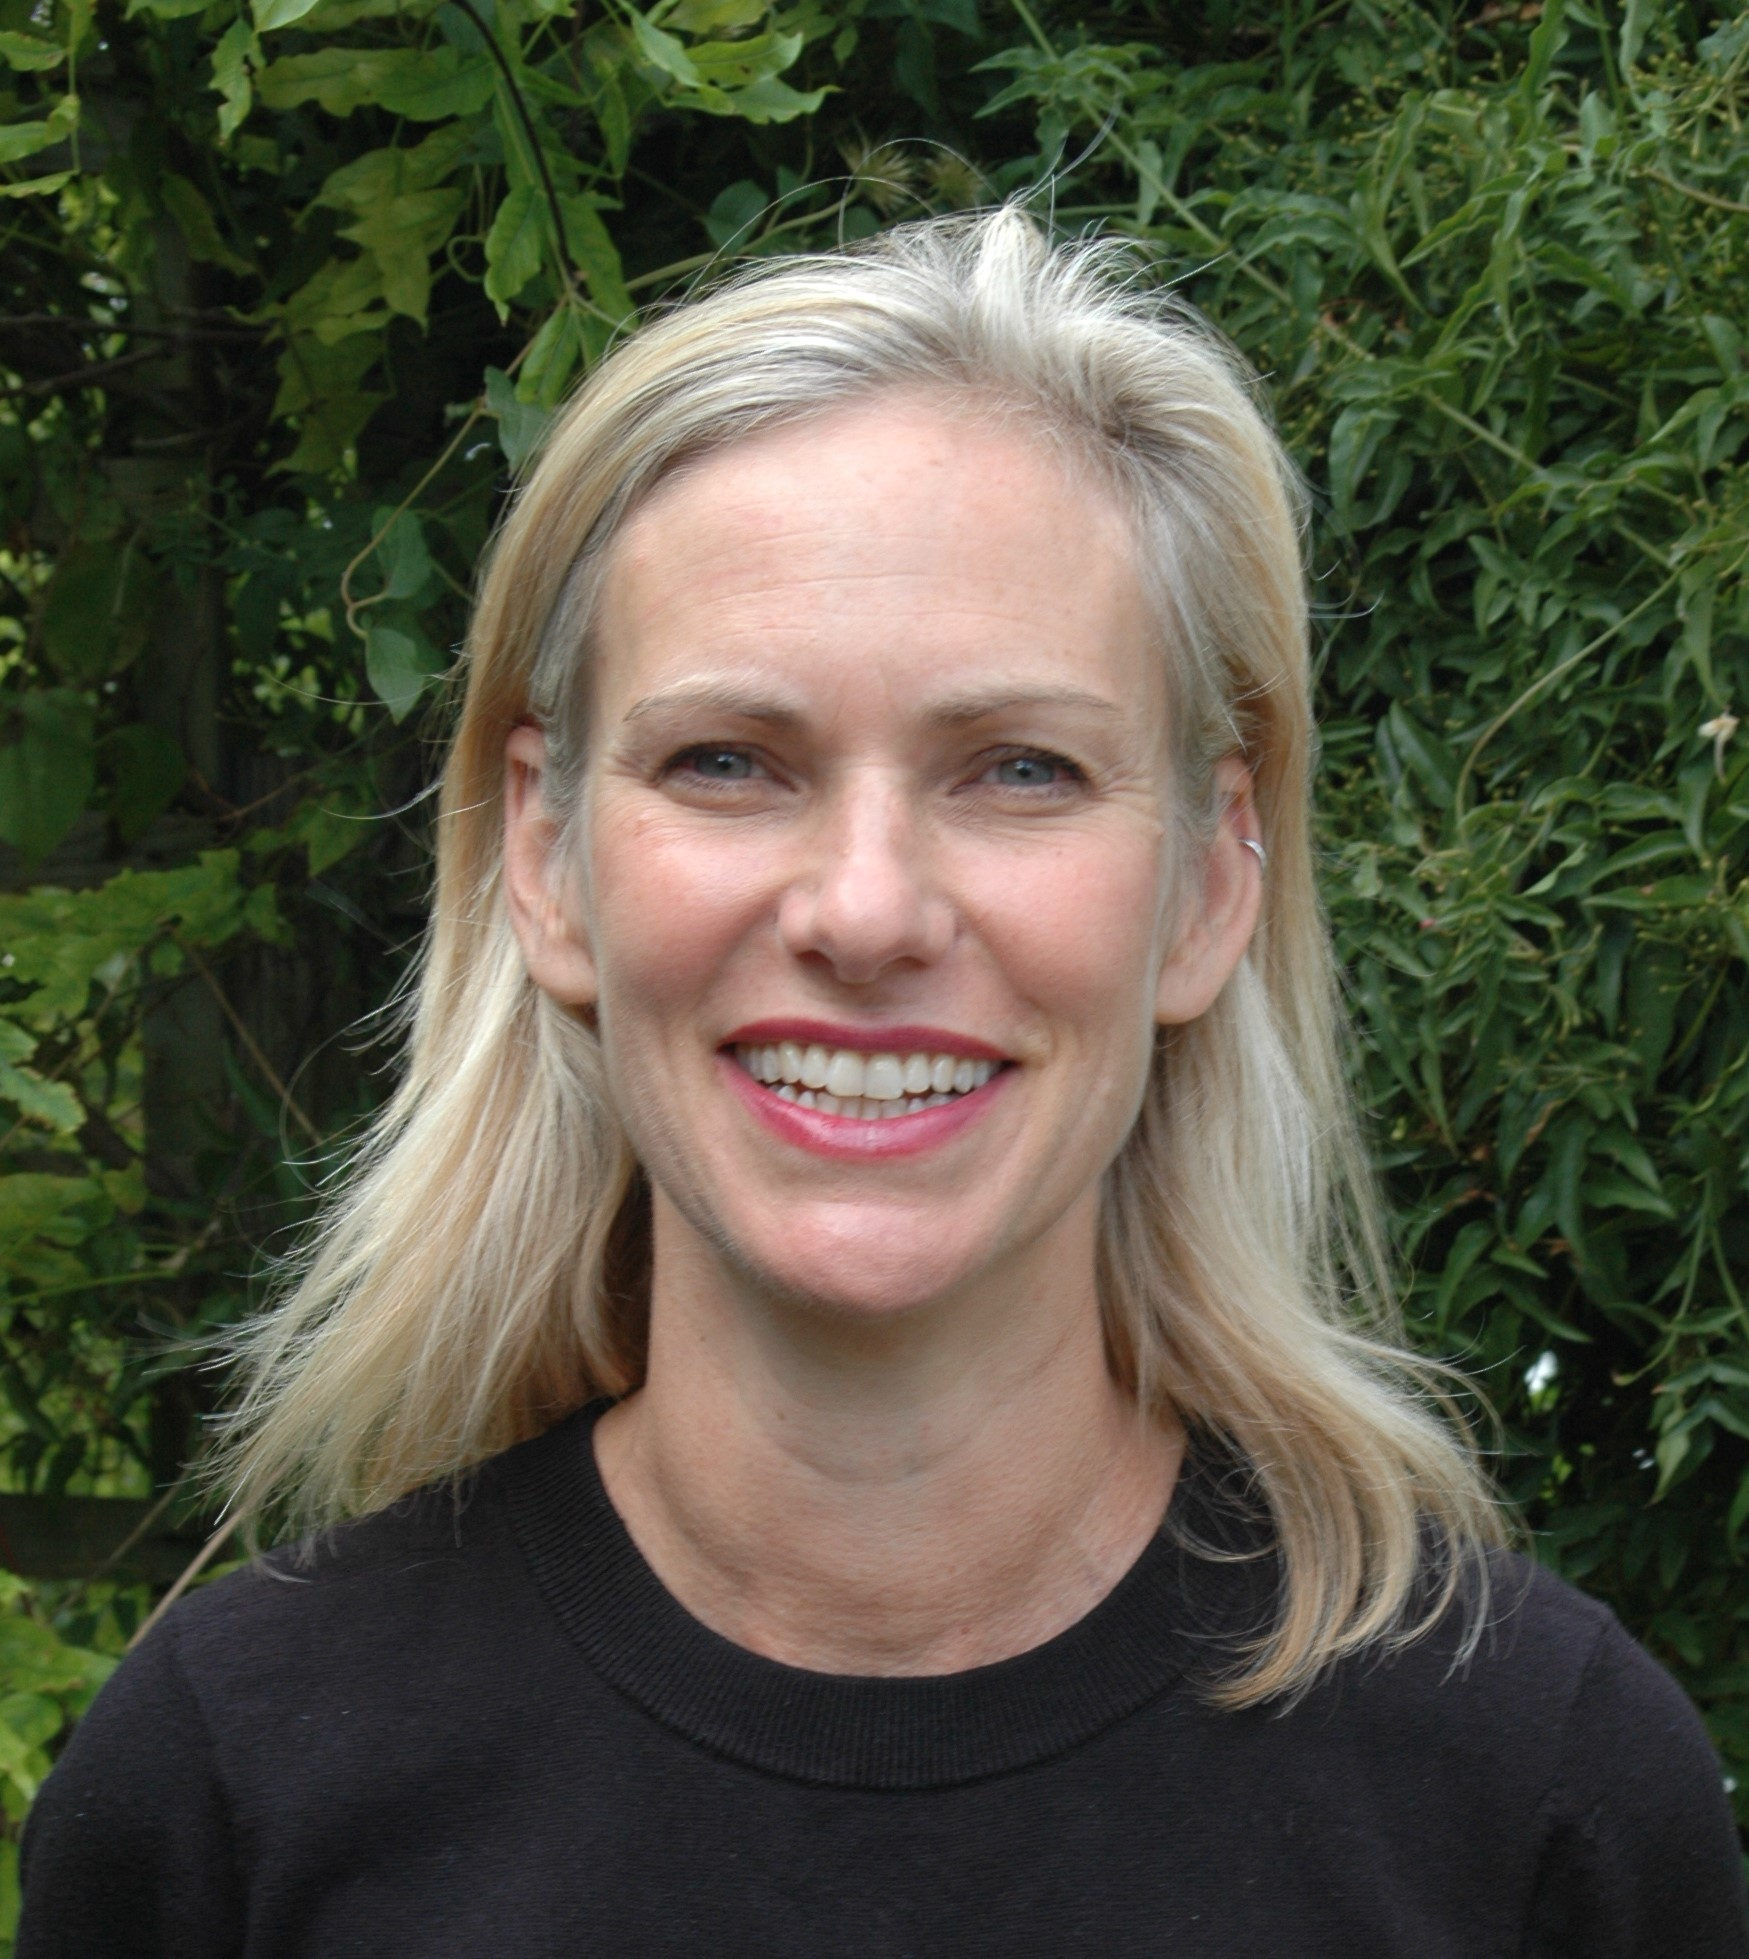 Kate levine headshot